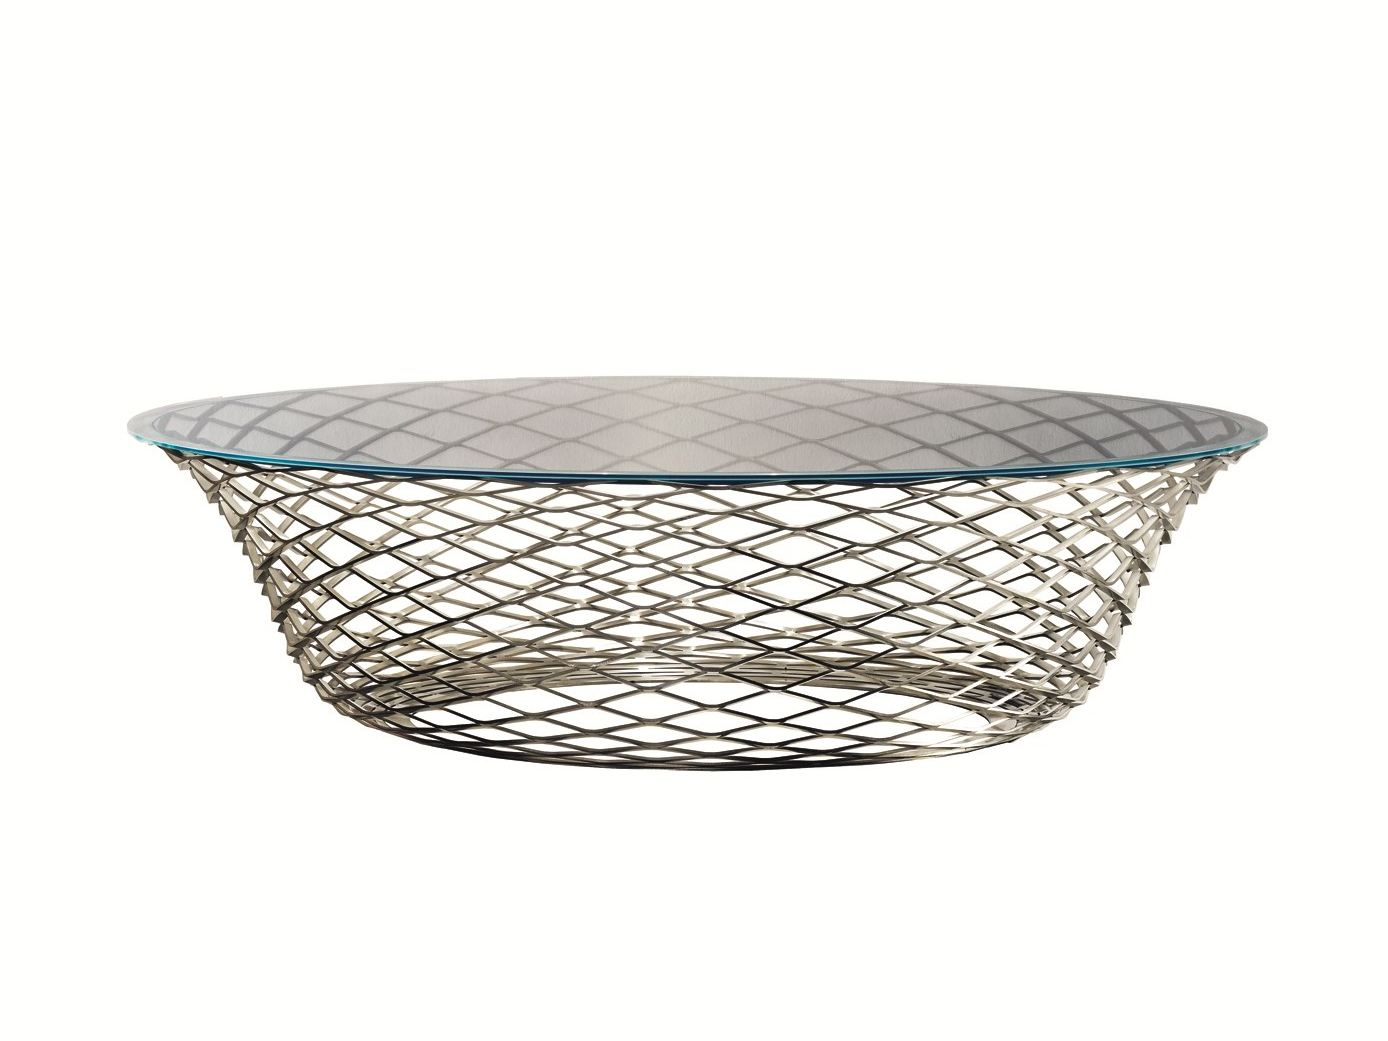 table basse ronde en acier inoxydable et verre teso by. Black Bedroom Furniture Sets. Home Design Ideas